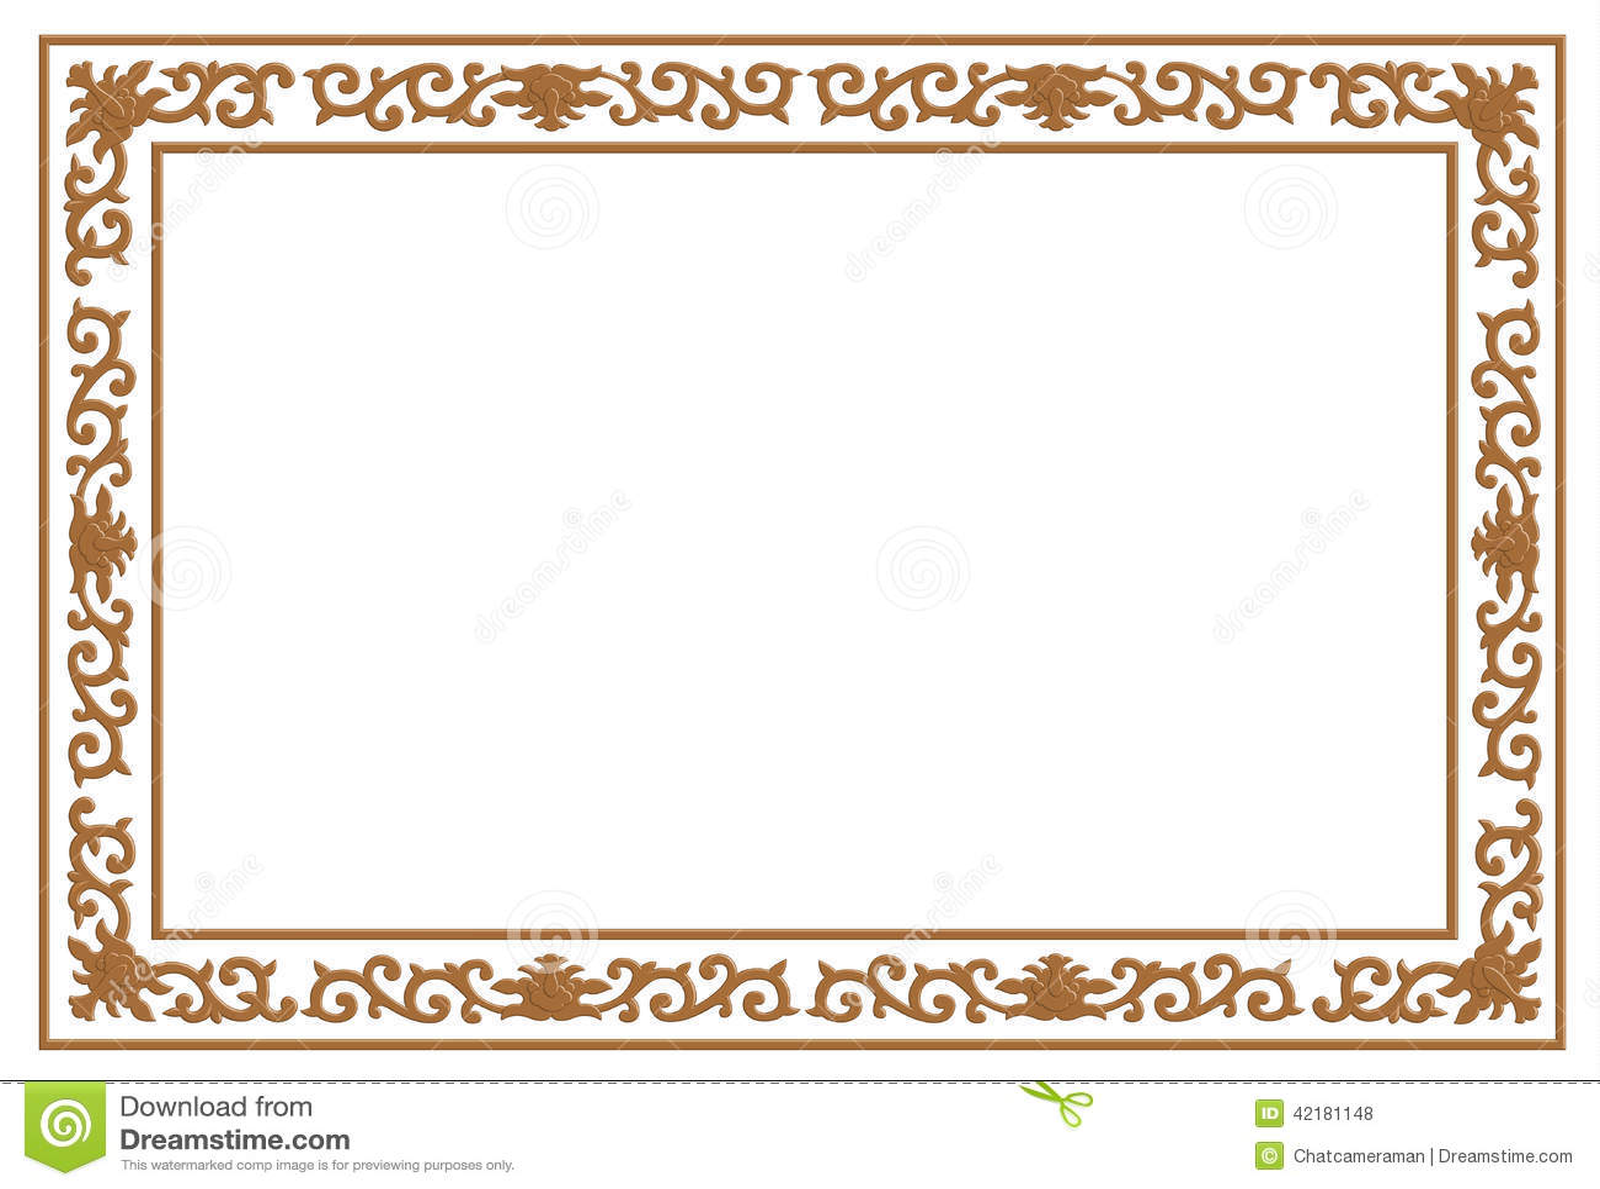 Floral wood carving border stock illustration ...